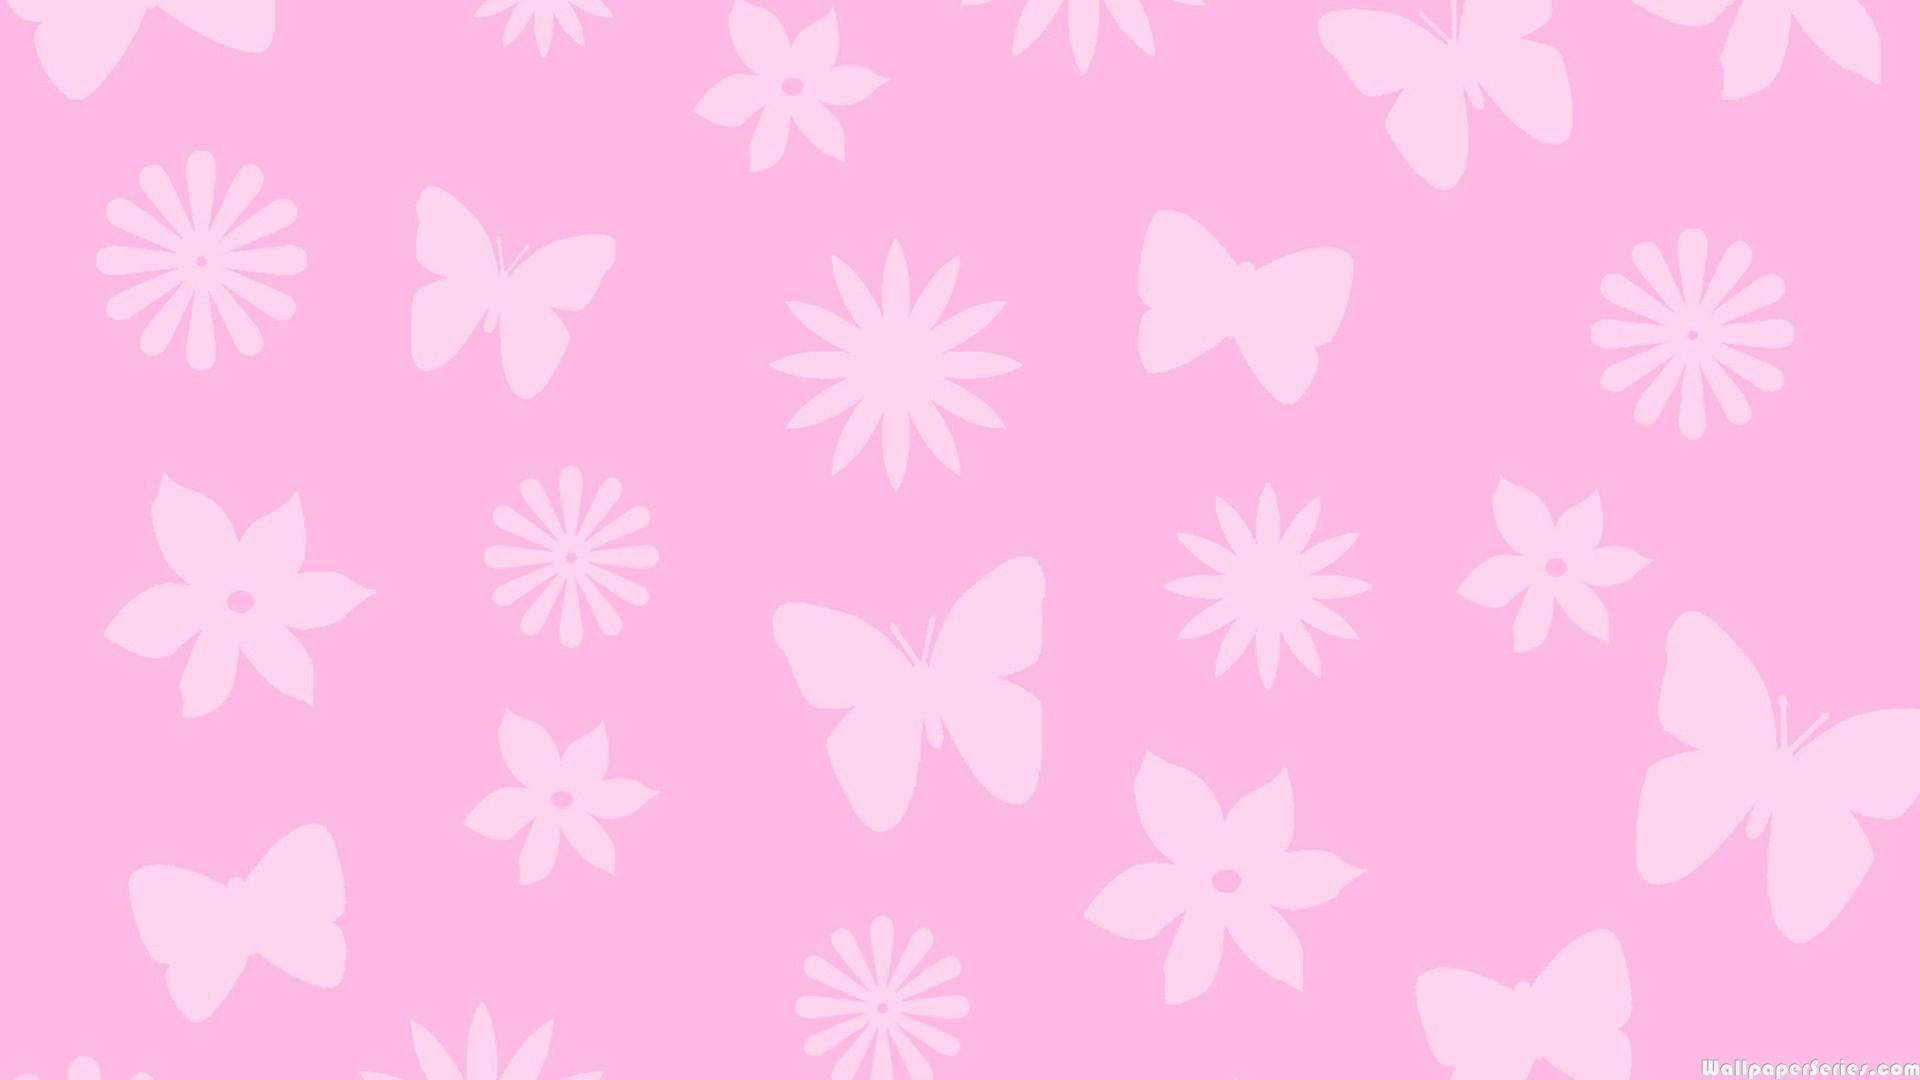 tumblr cute backgrounds - HD1920×1080